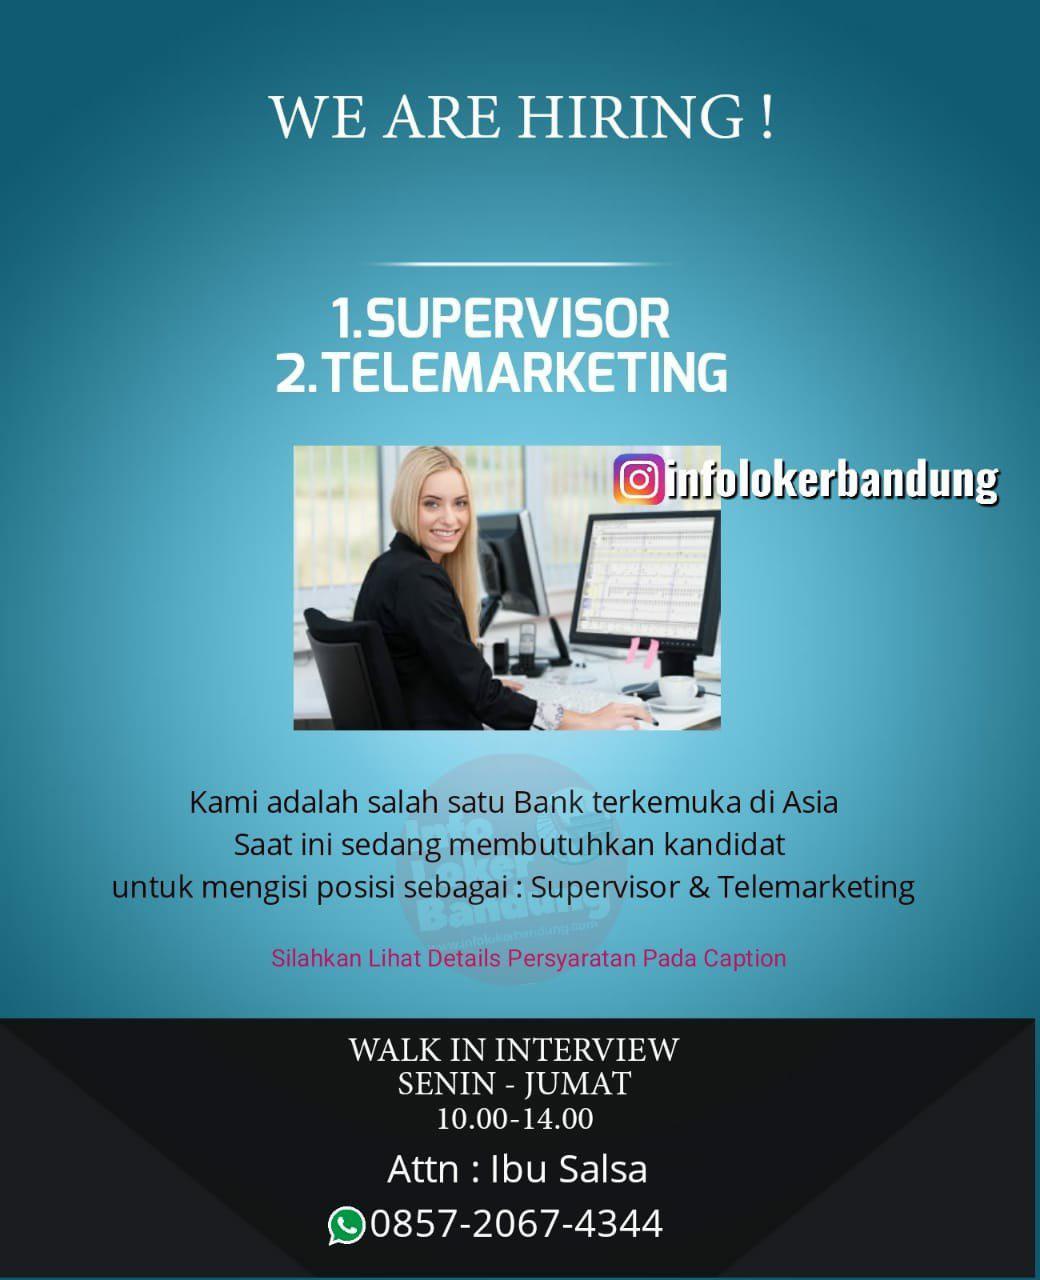 Lowongan Kerja Supervisor & Telemarketing Bandung April 2019